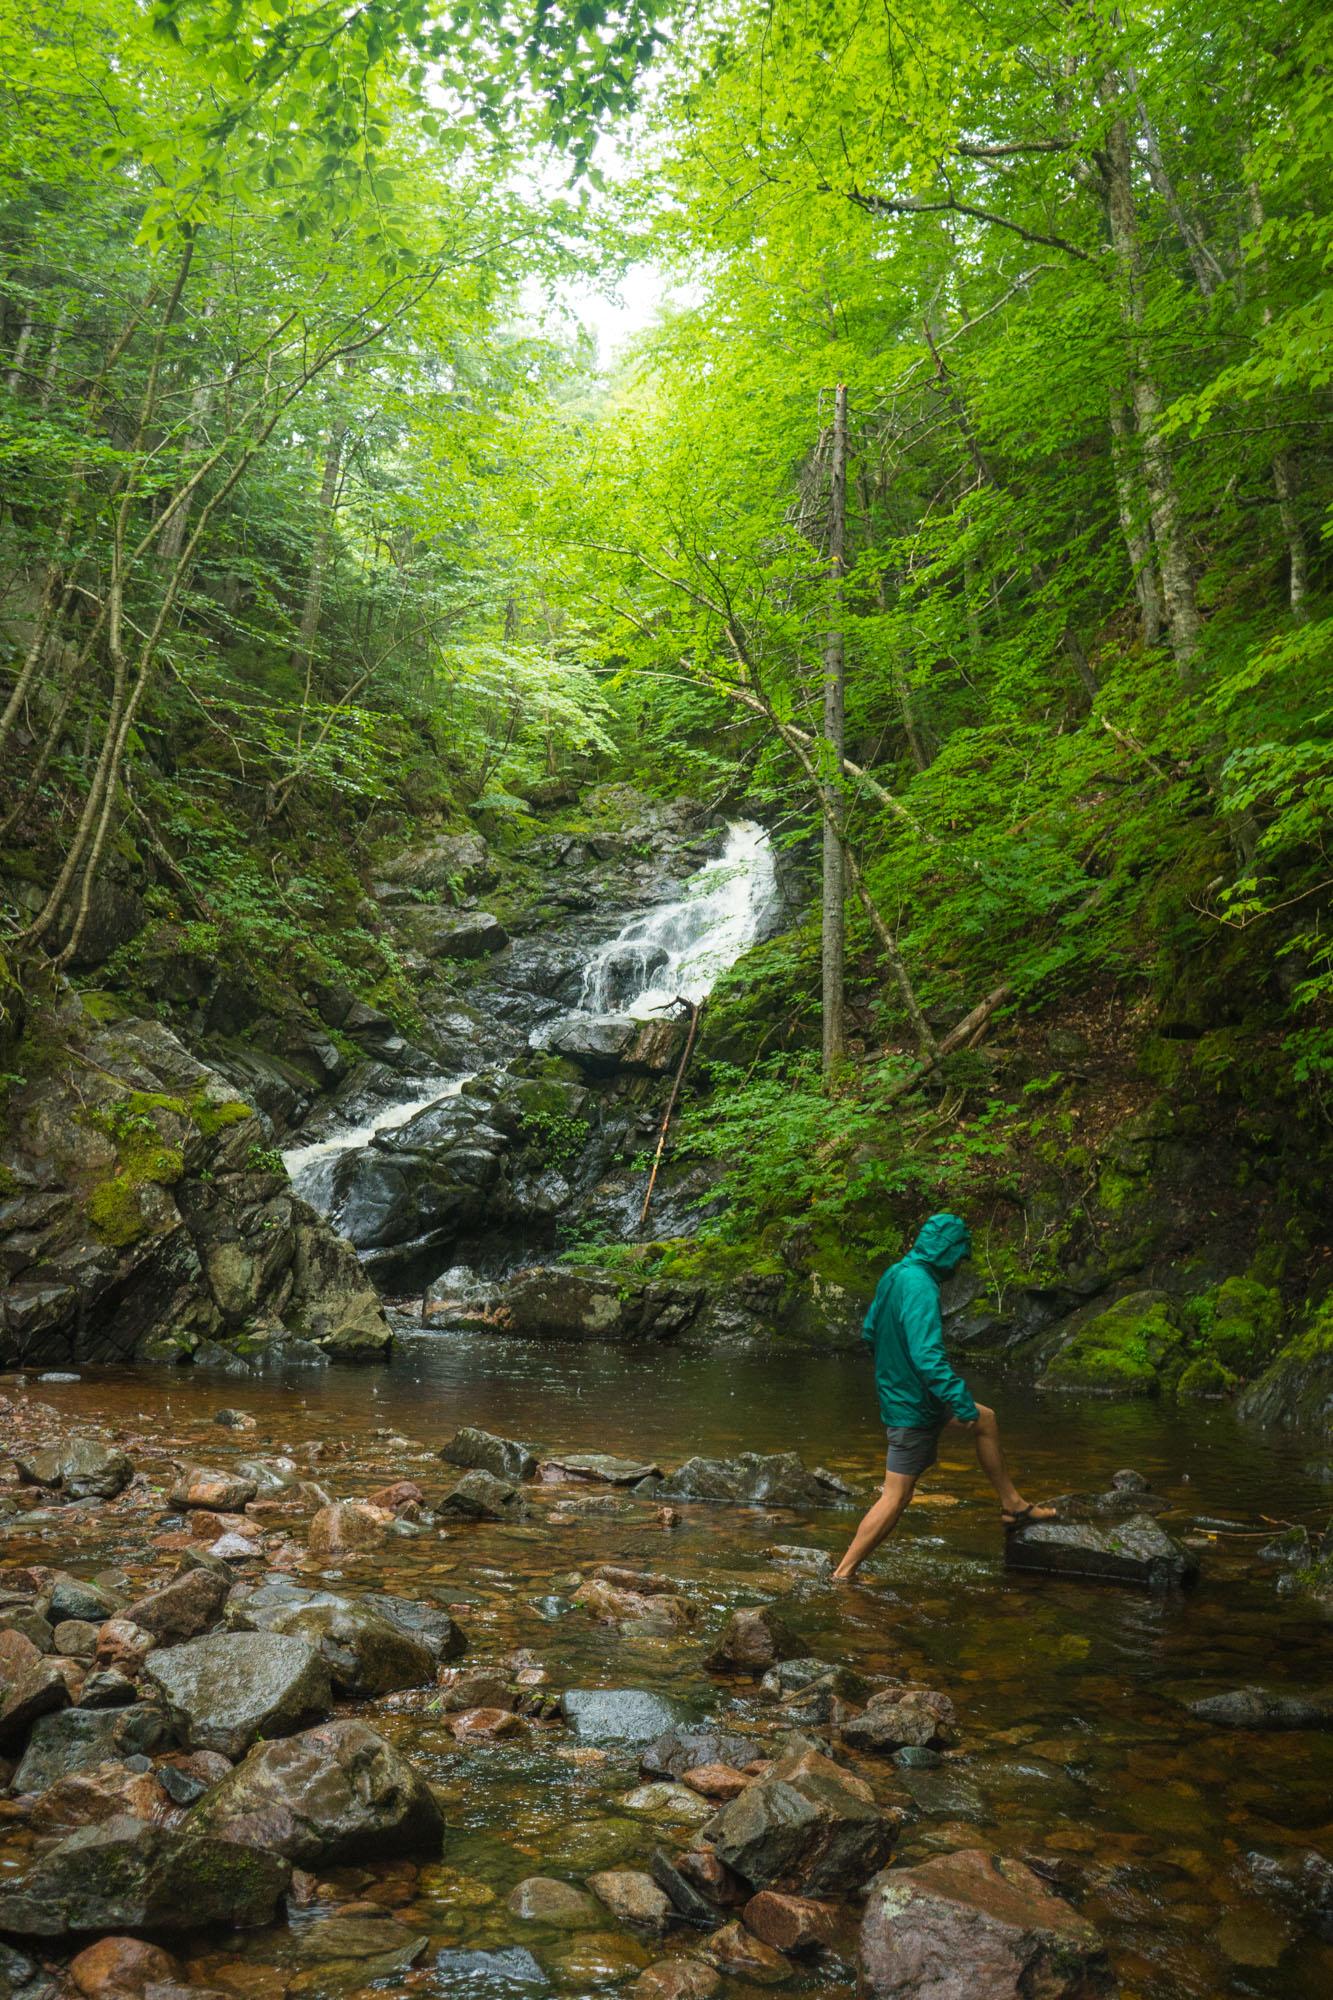 Owen exploring a waterfall in Cape Breton NP